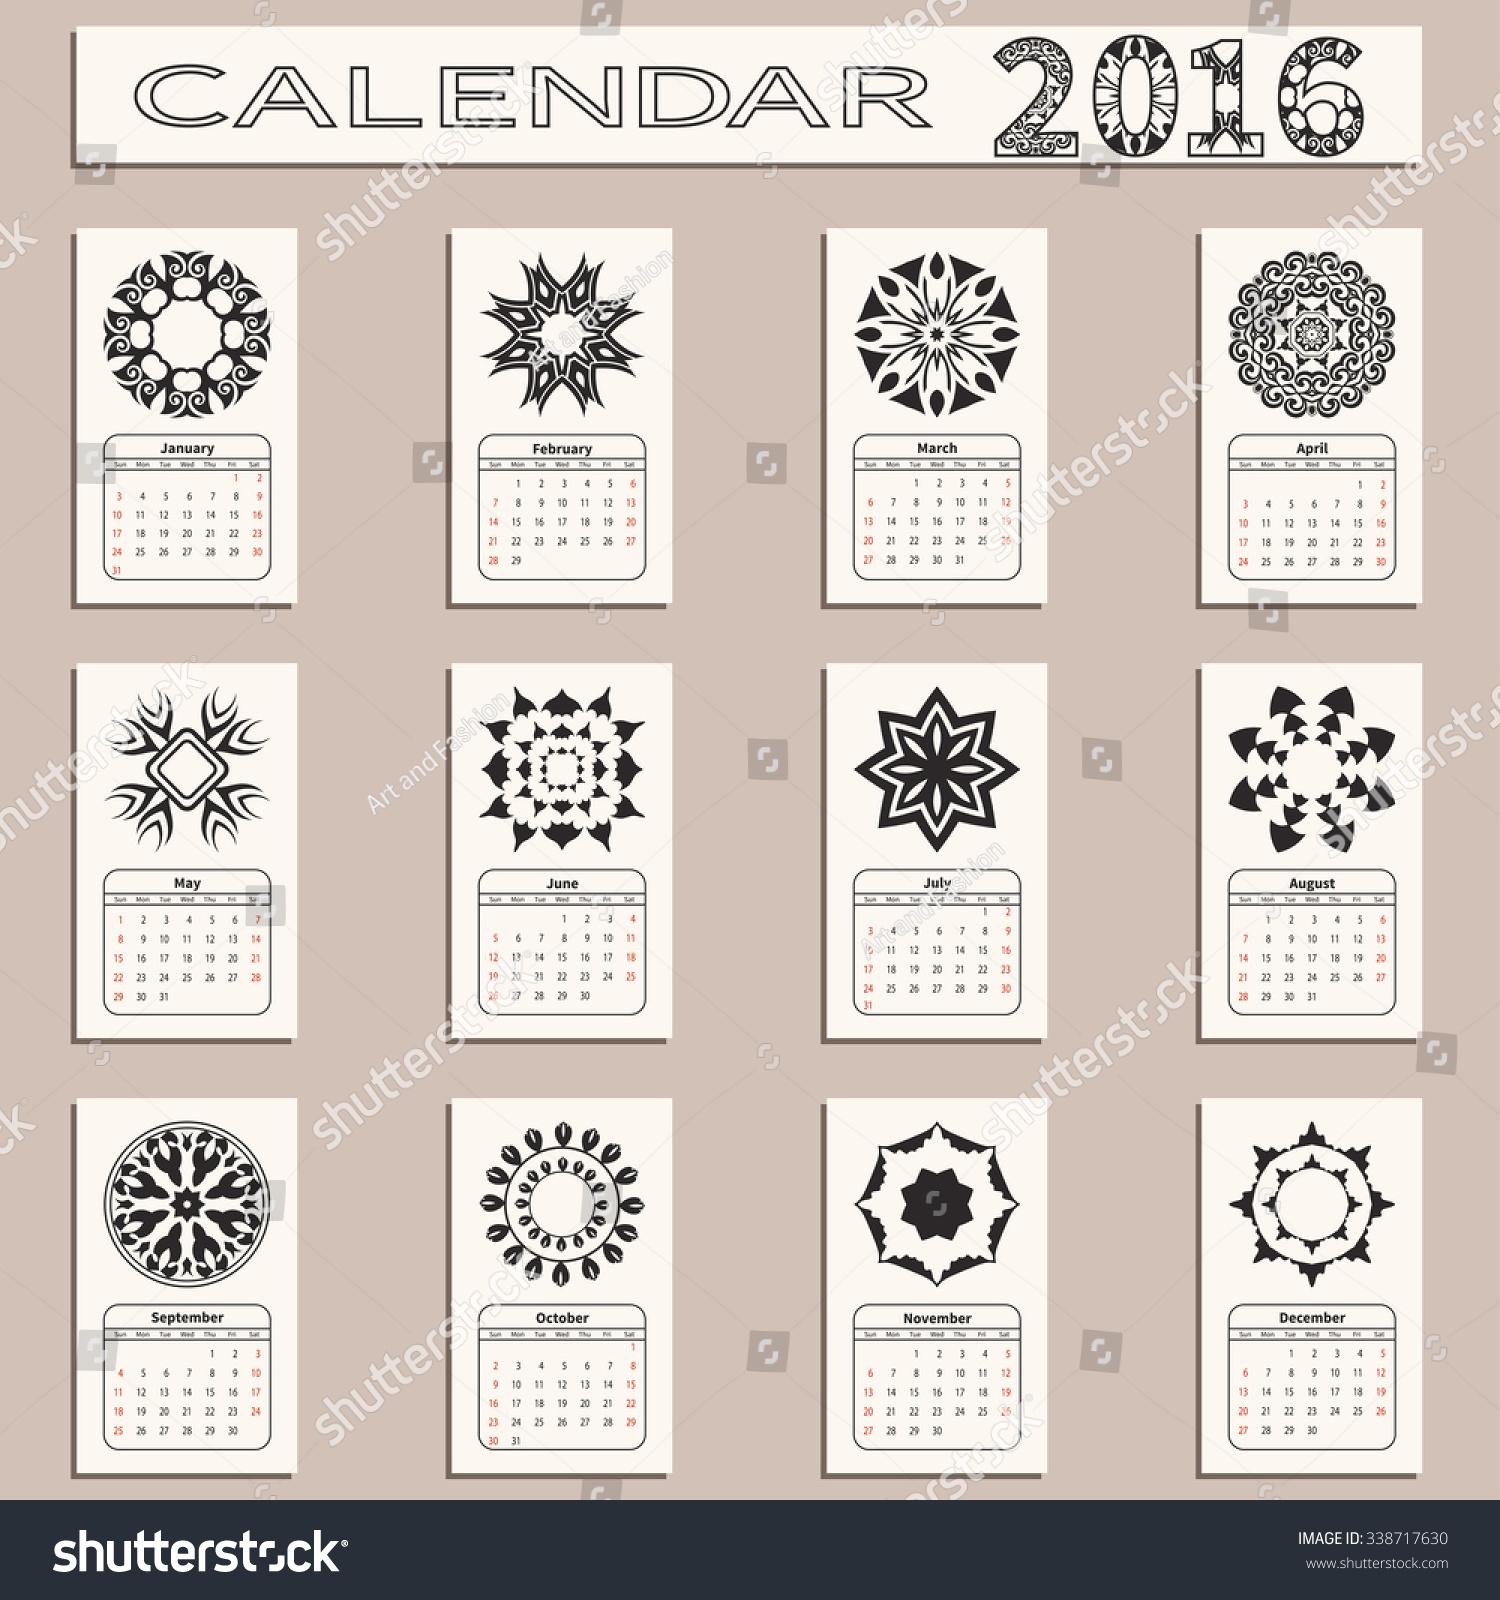 Calendar Vintage Vector : Calendar vintage decorative elements round ornaments